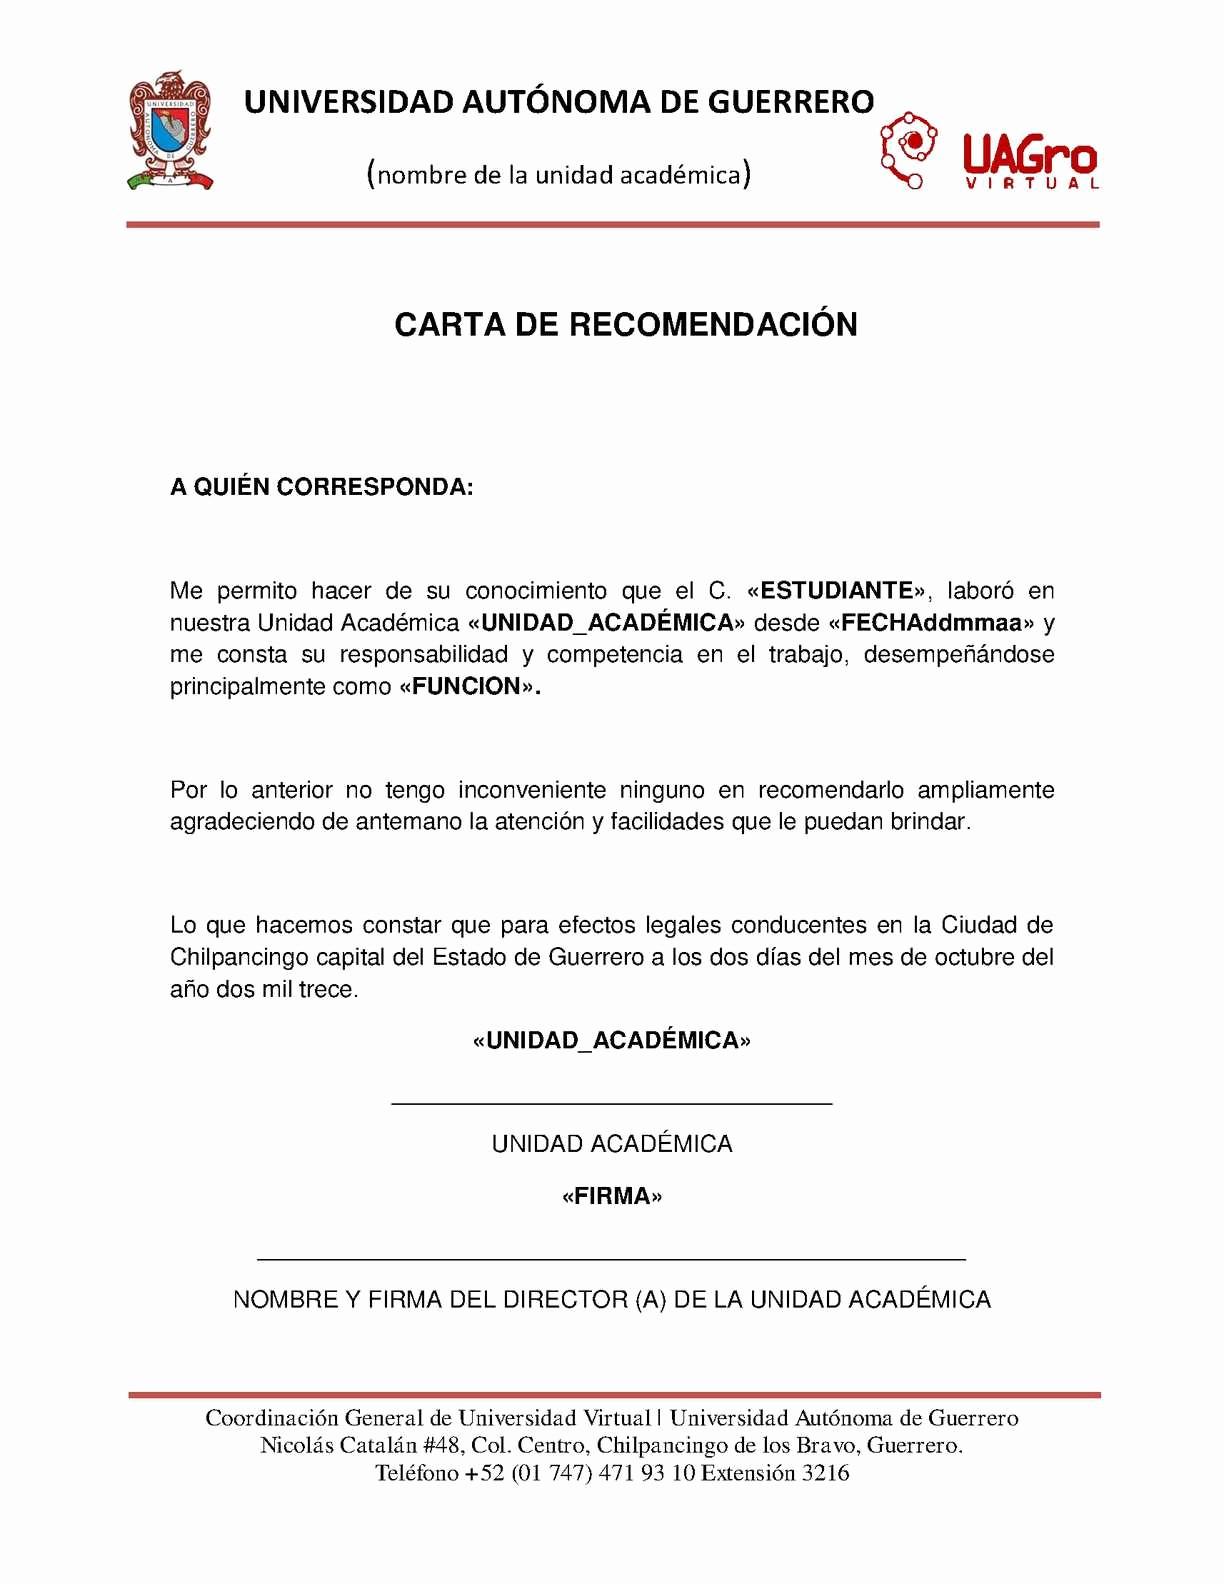 Carta De Recomendacion Para Estudiante Fresh Calaméo Mtic Eje 3 Tema 6 Carta